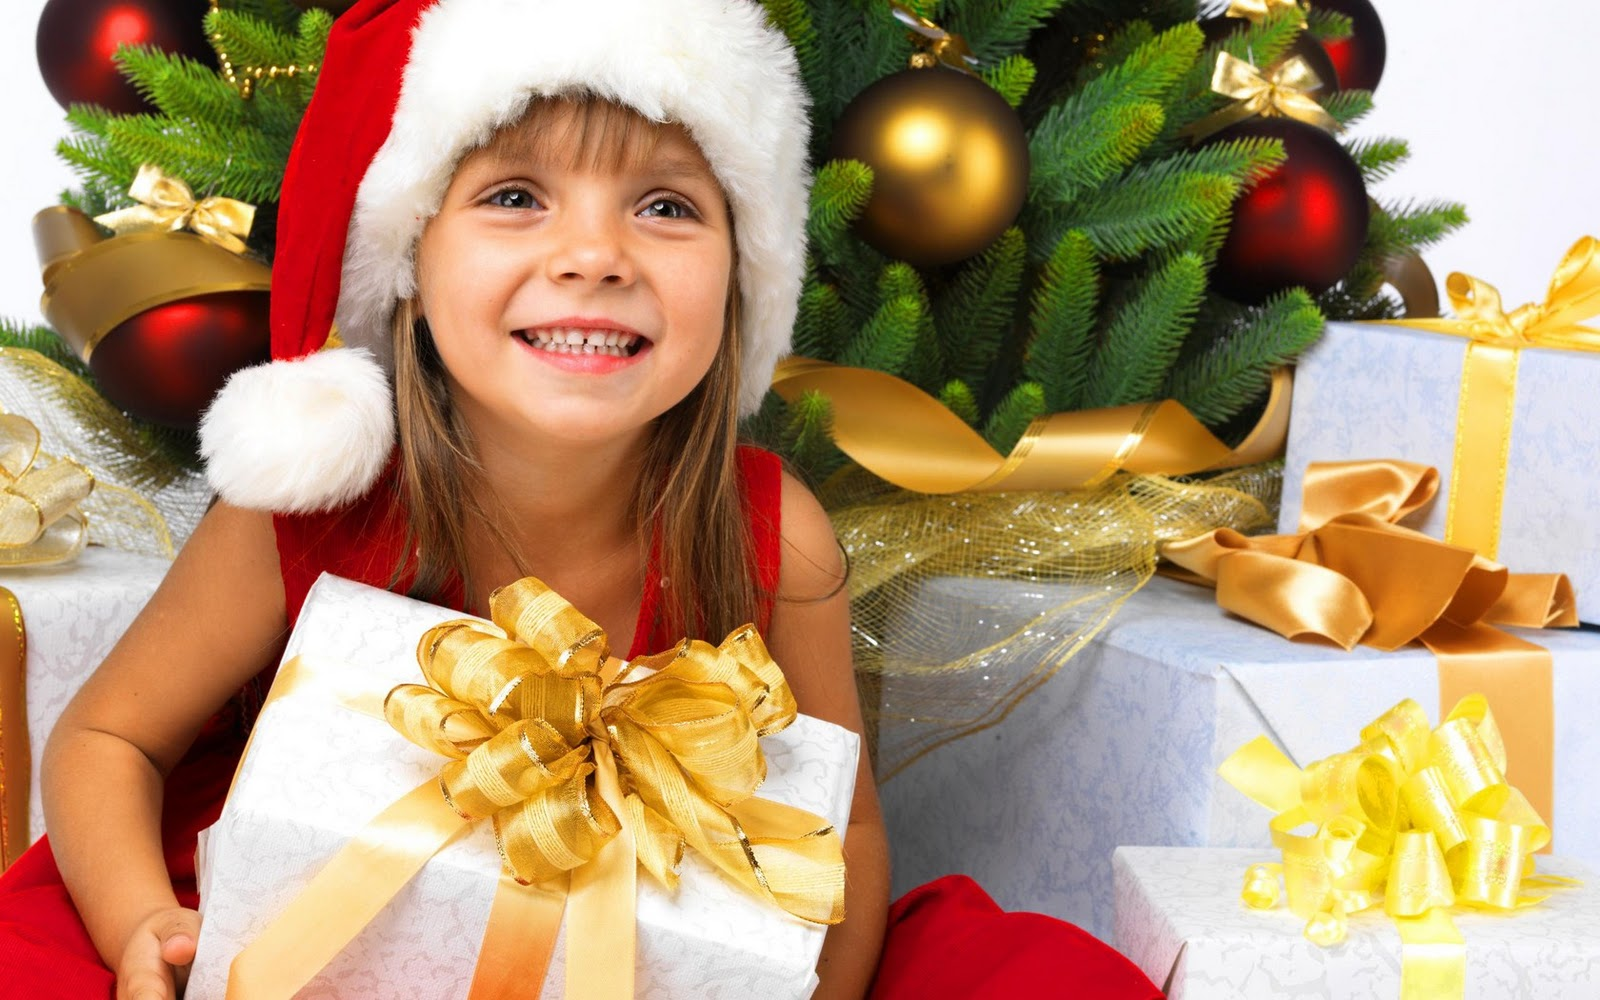 http://3.bp.blogspot.com/-q9EiWrcXunU/Tt8OpN8oslI/AAAAAAAAAeo/15zyHc2Me8U/s1600/Chrismas+Tree+Santa+Children+HD+Wallpaper+-+UniqueWalls.Blogspot.Com.jpg